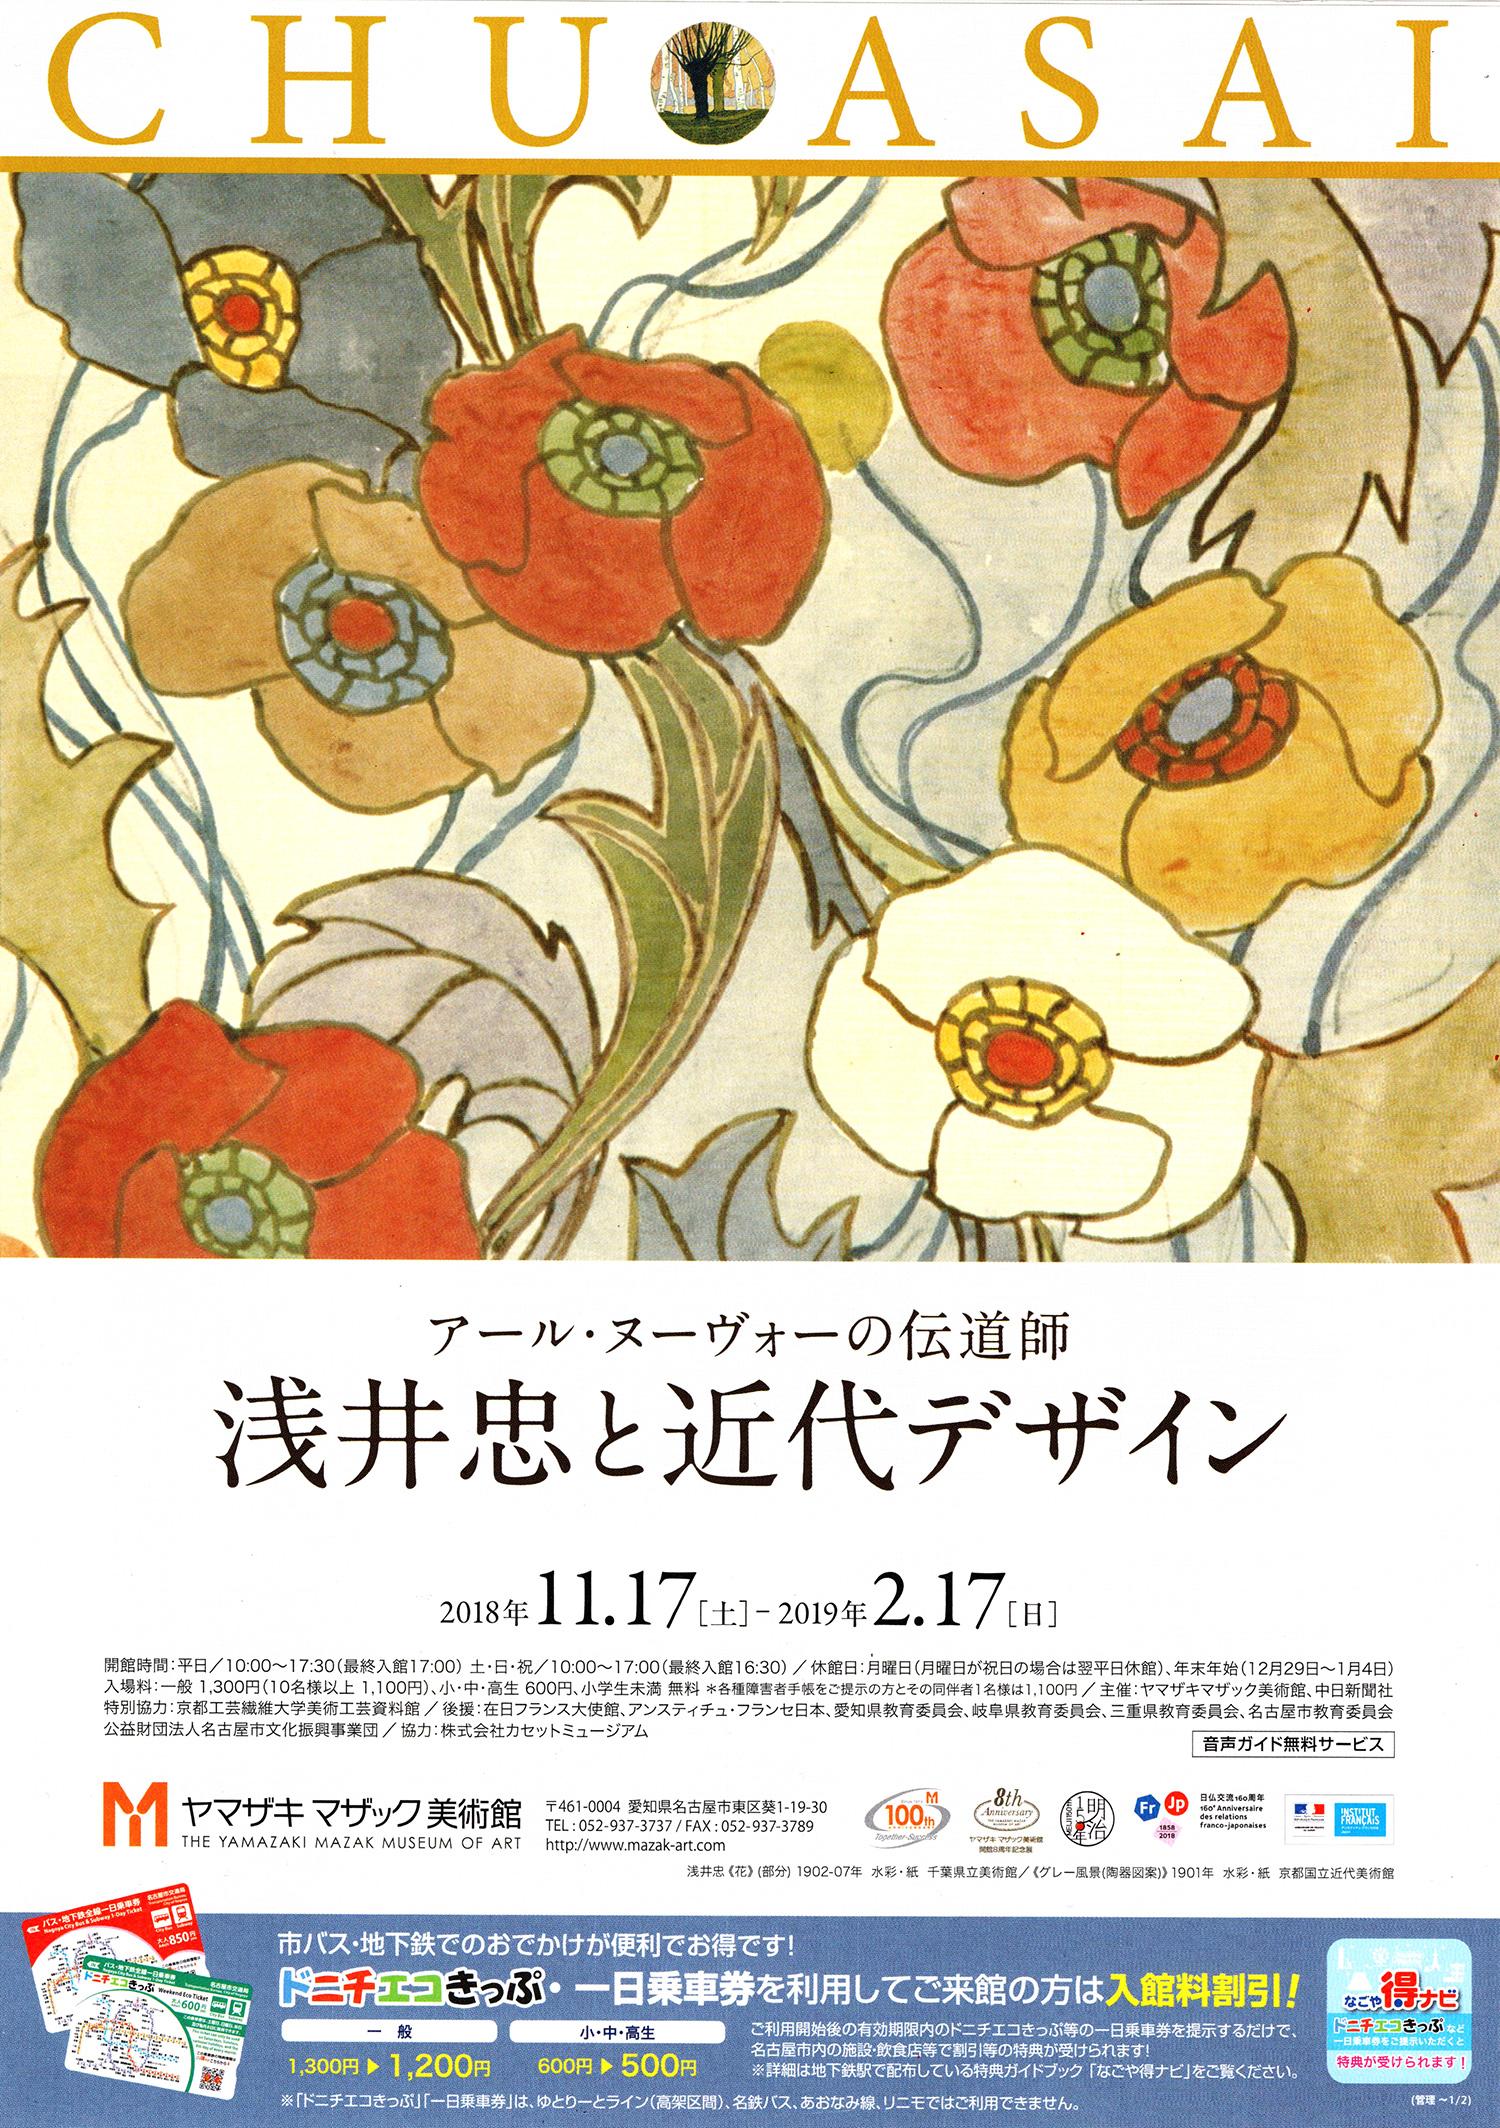 190213_asai_chu01.jpg